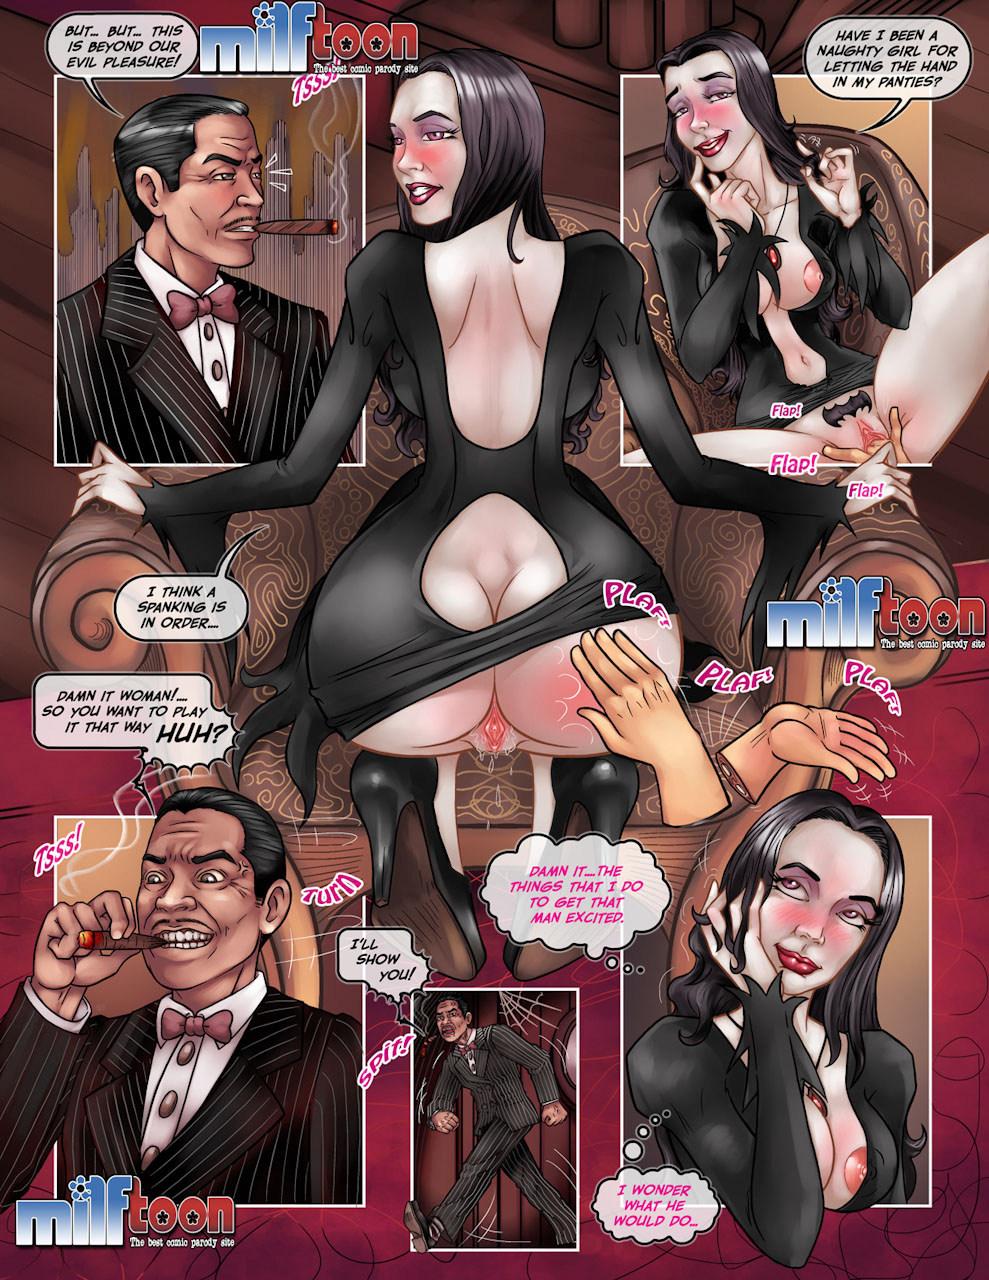 Addams Family Porn milftoon – addams family porn parody porn comics